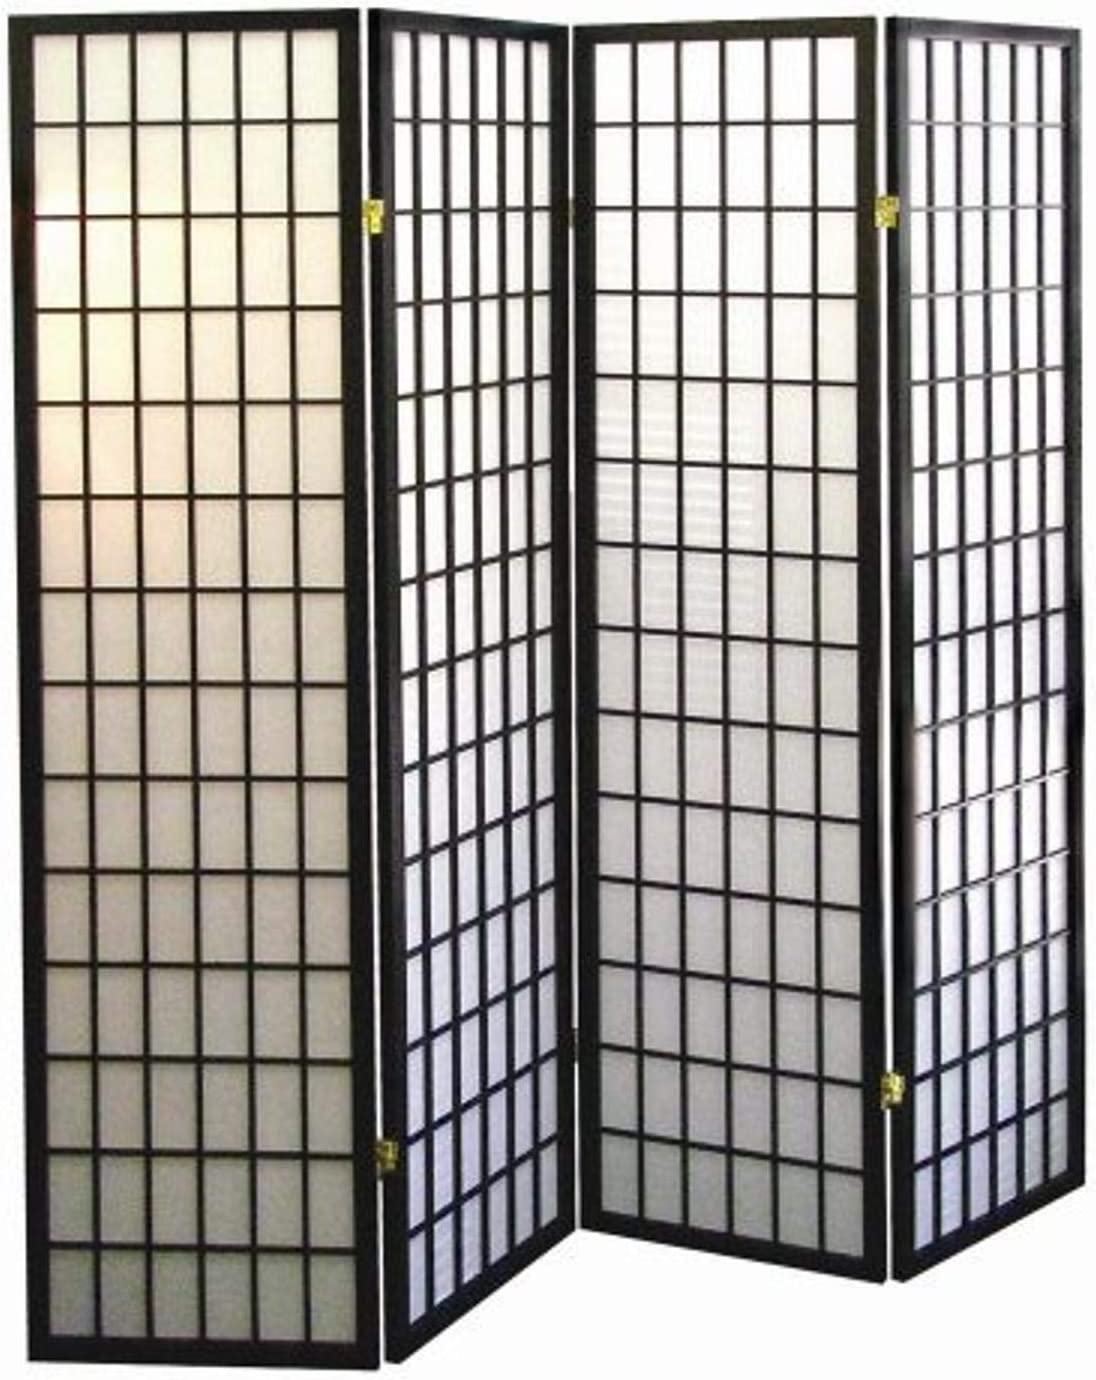 ORE International 4-Panel Shoji Screen Room Divider, Black: Furniture & Decor